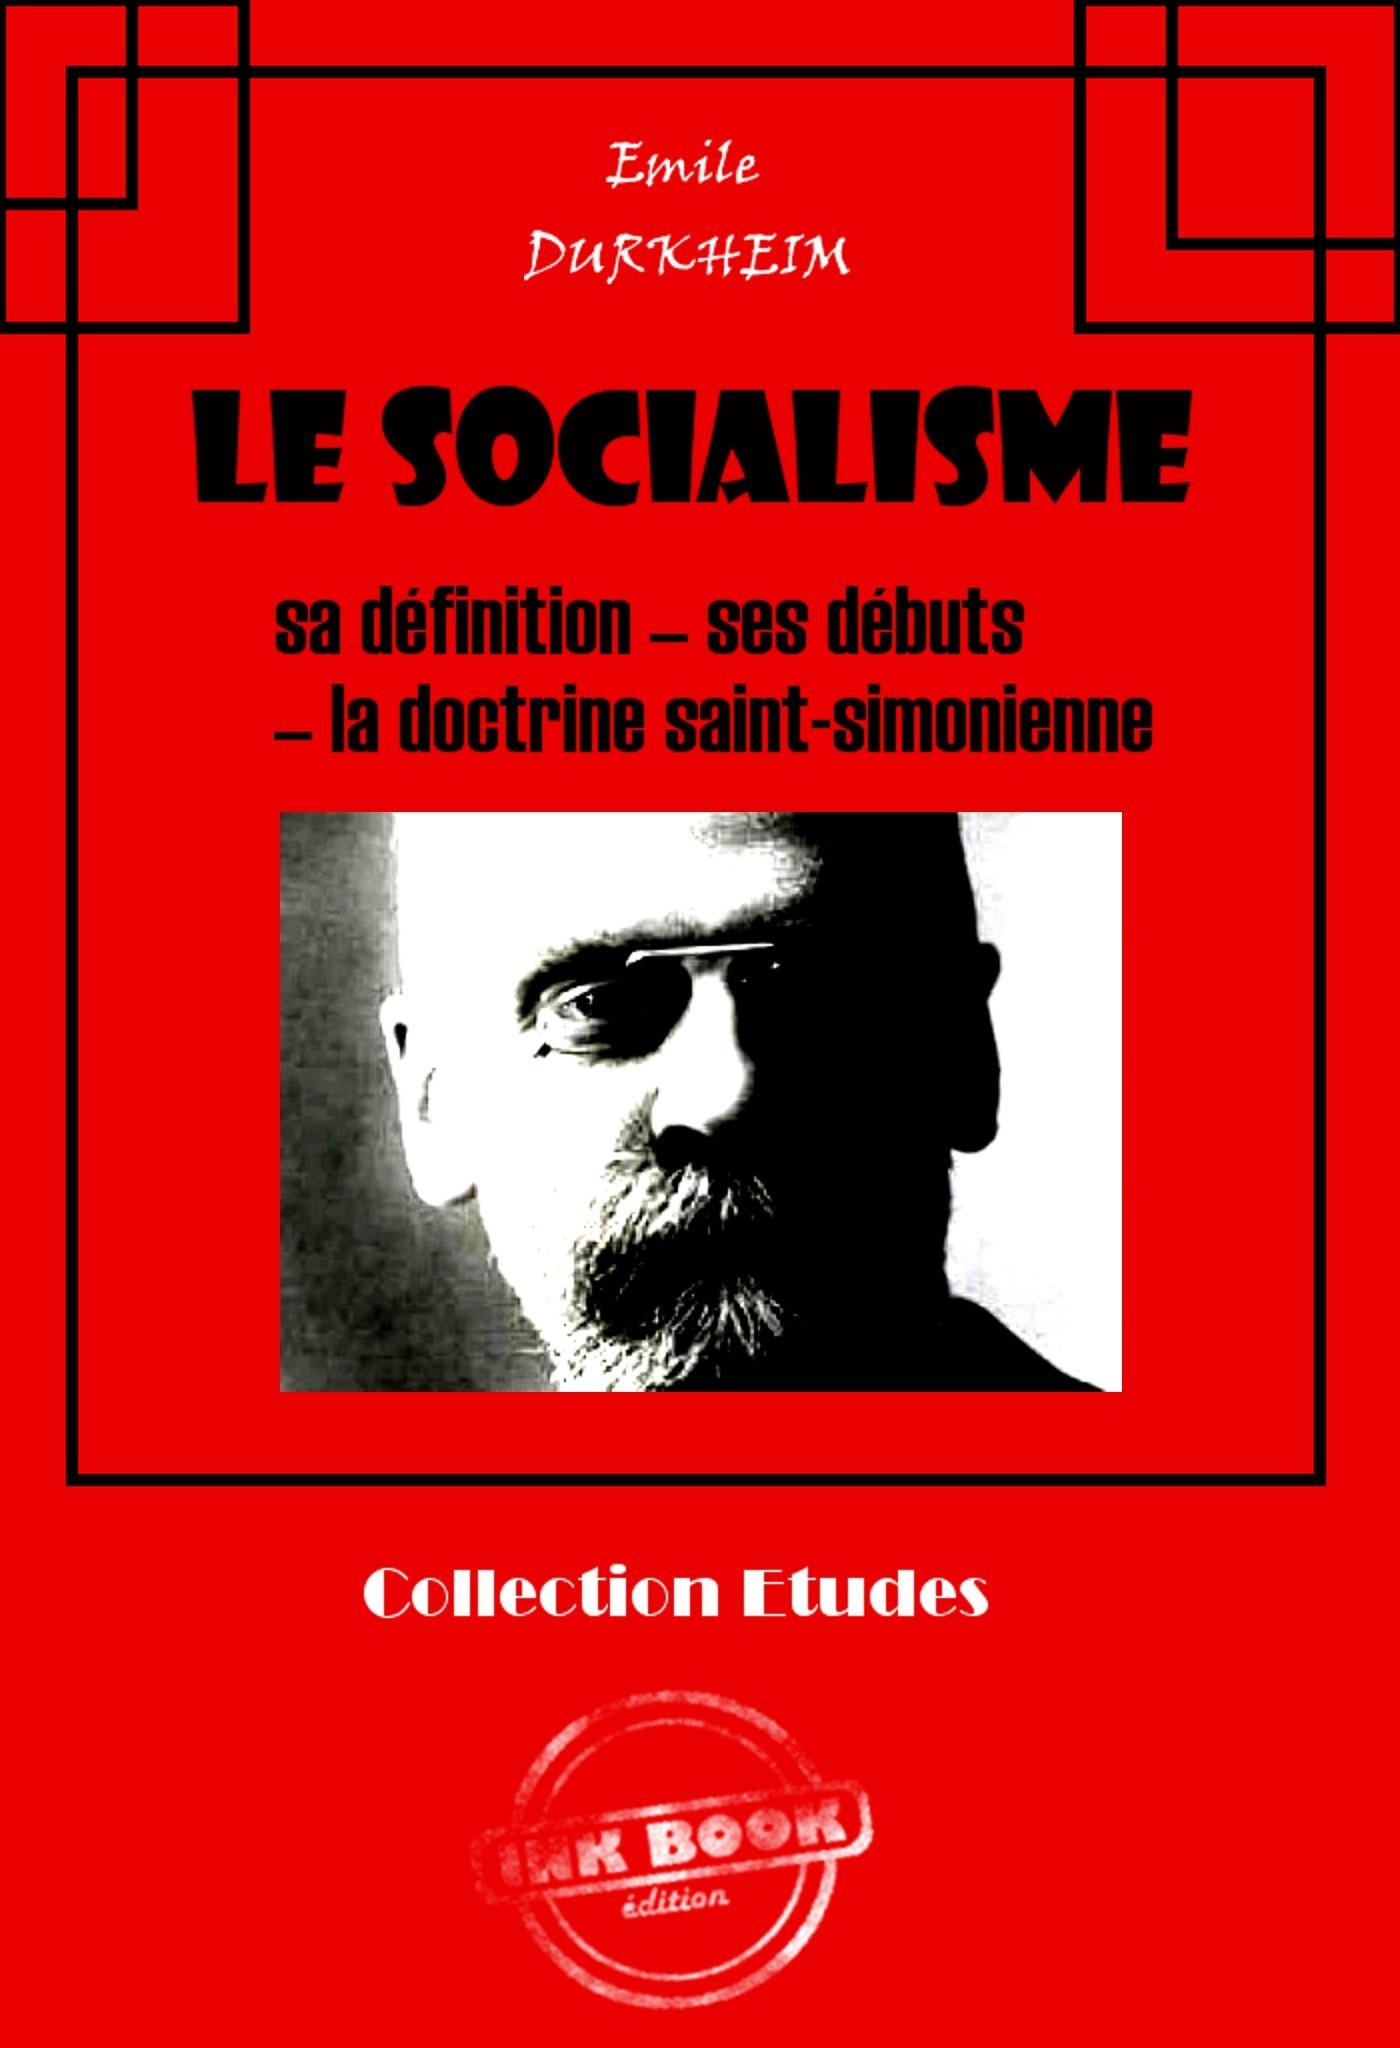 Le socialisme